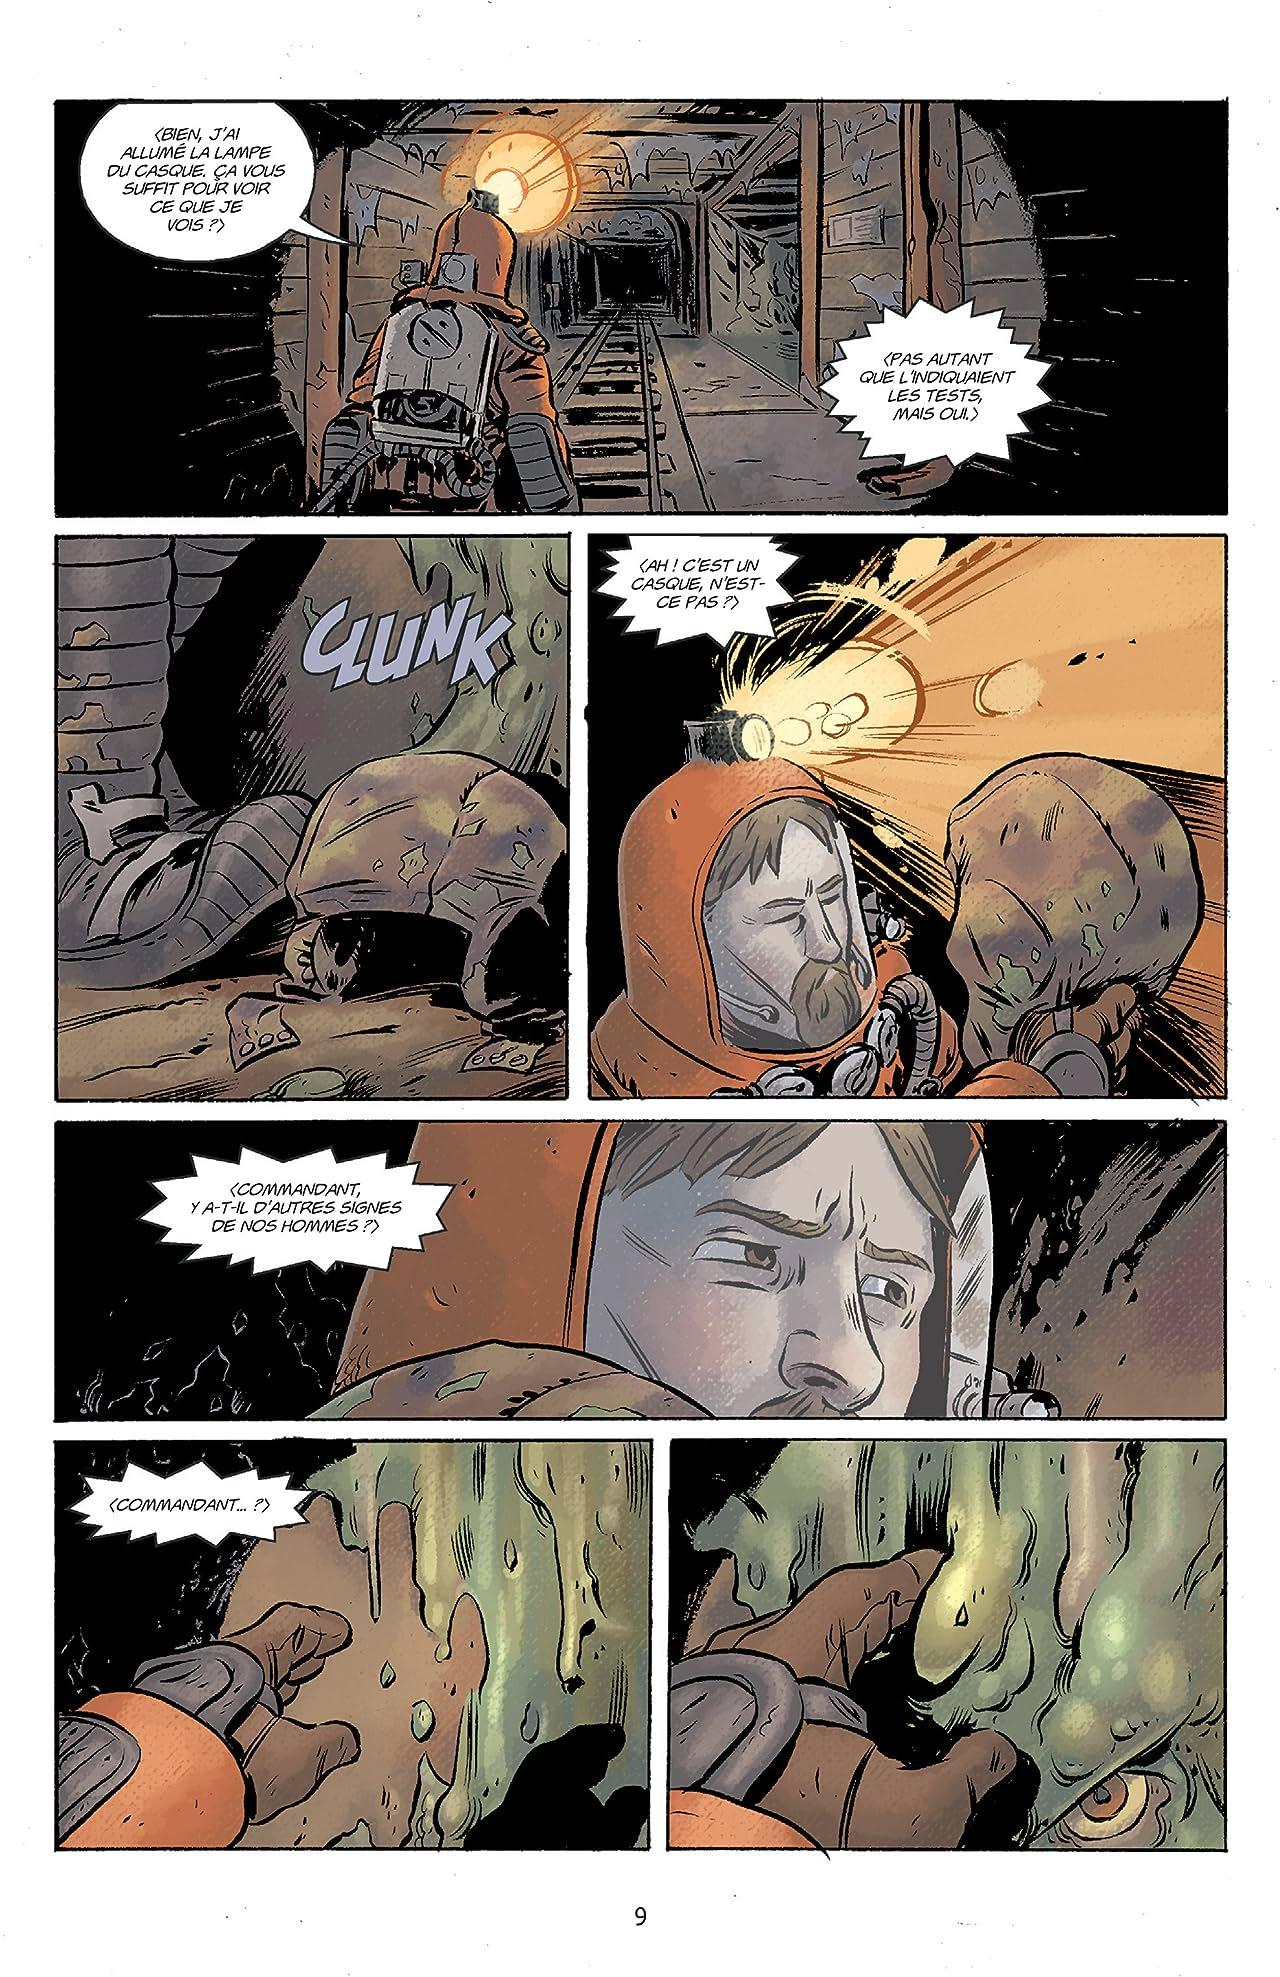 BPRD - L'enfer sur terre Vol. 2: La Longue Mort